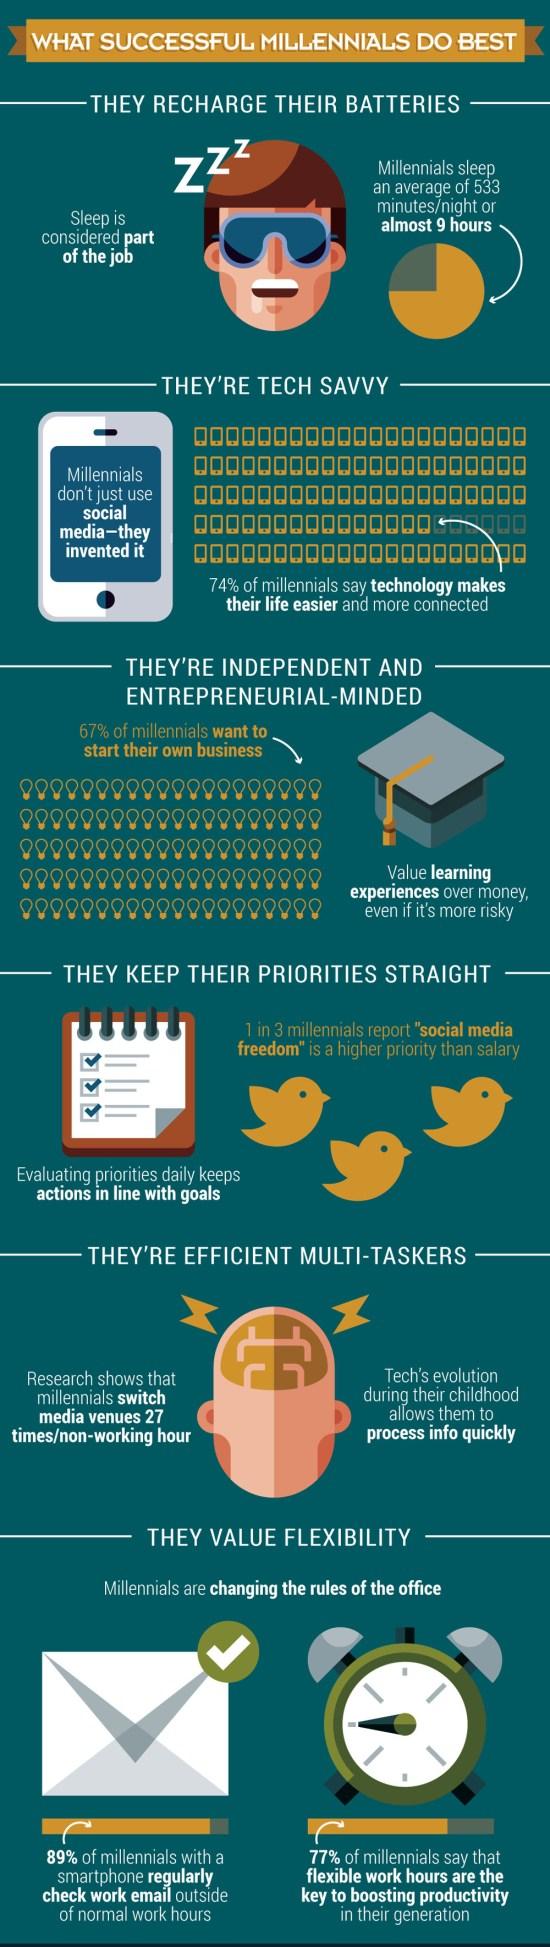 Successful Millennials Infographic